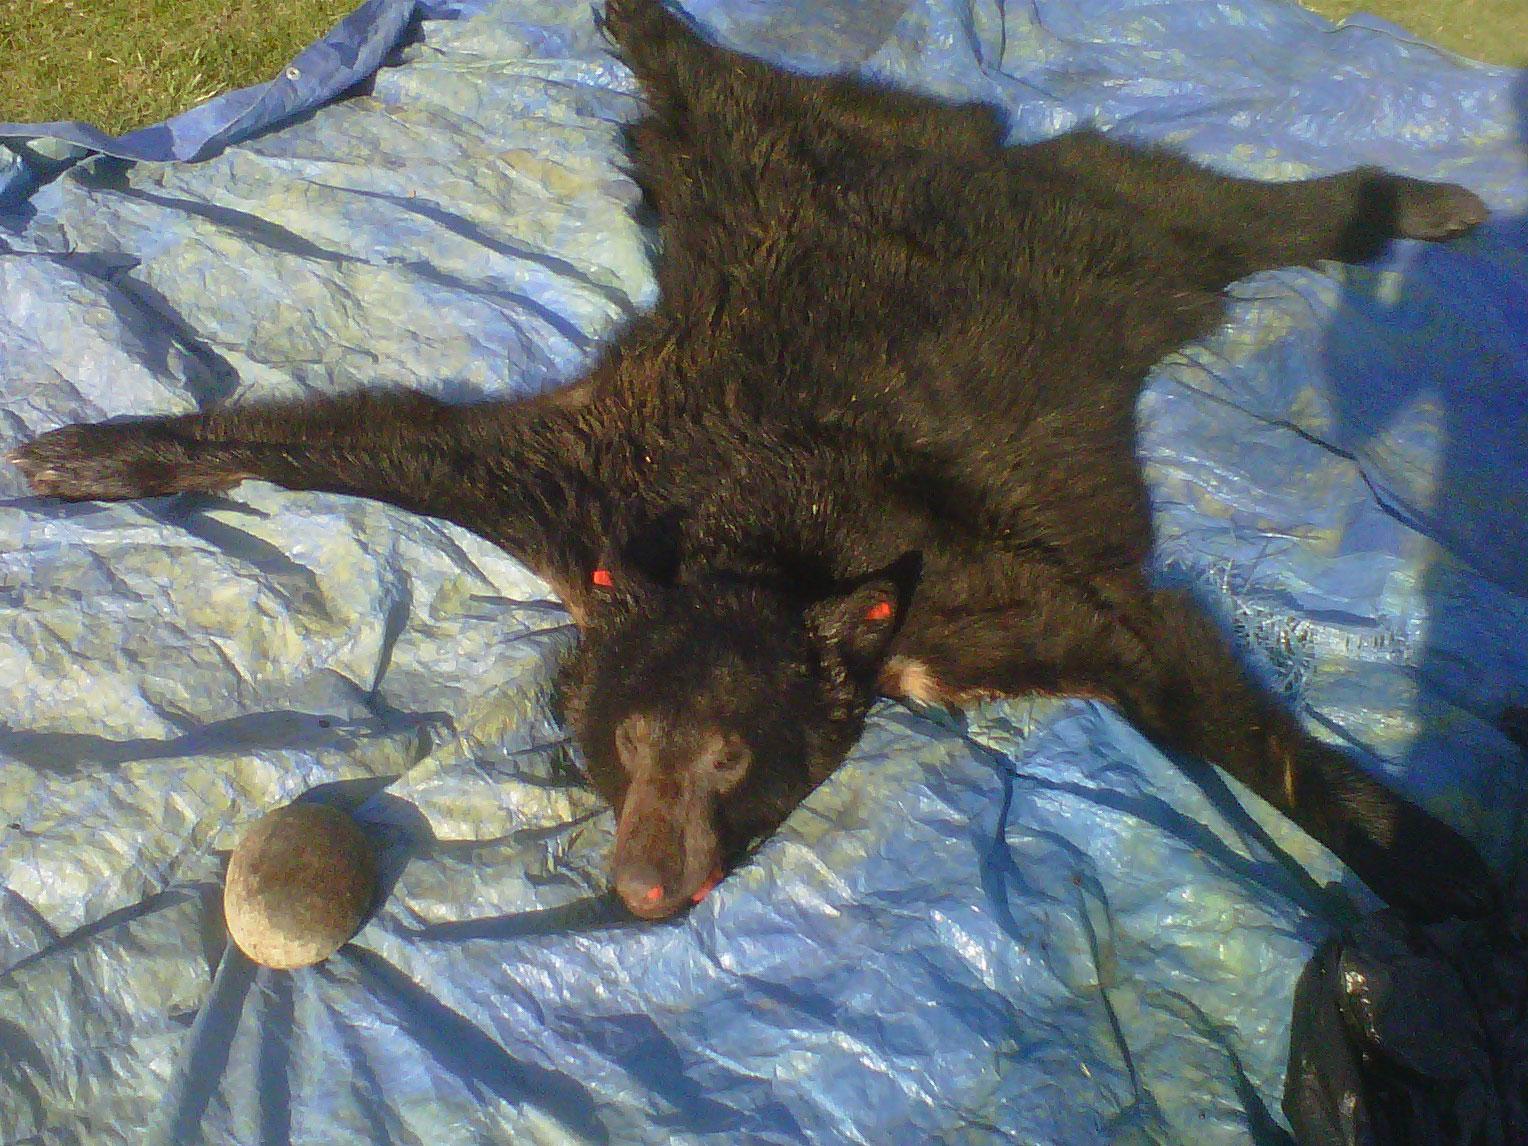 A photo of the bear skin - courtesy Jeffrey Jenkins